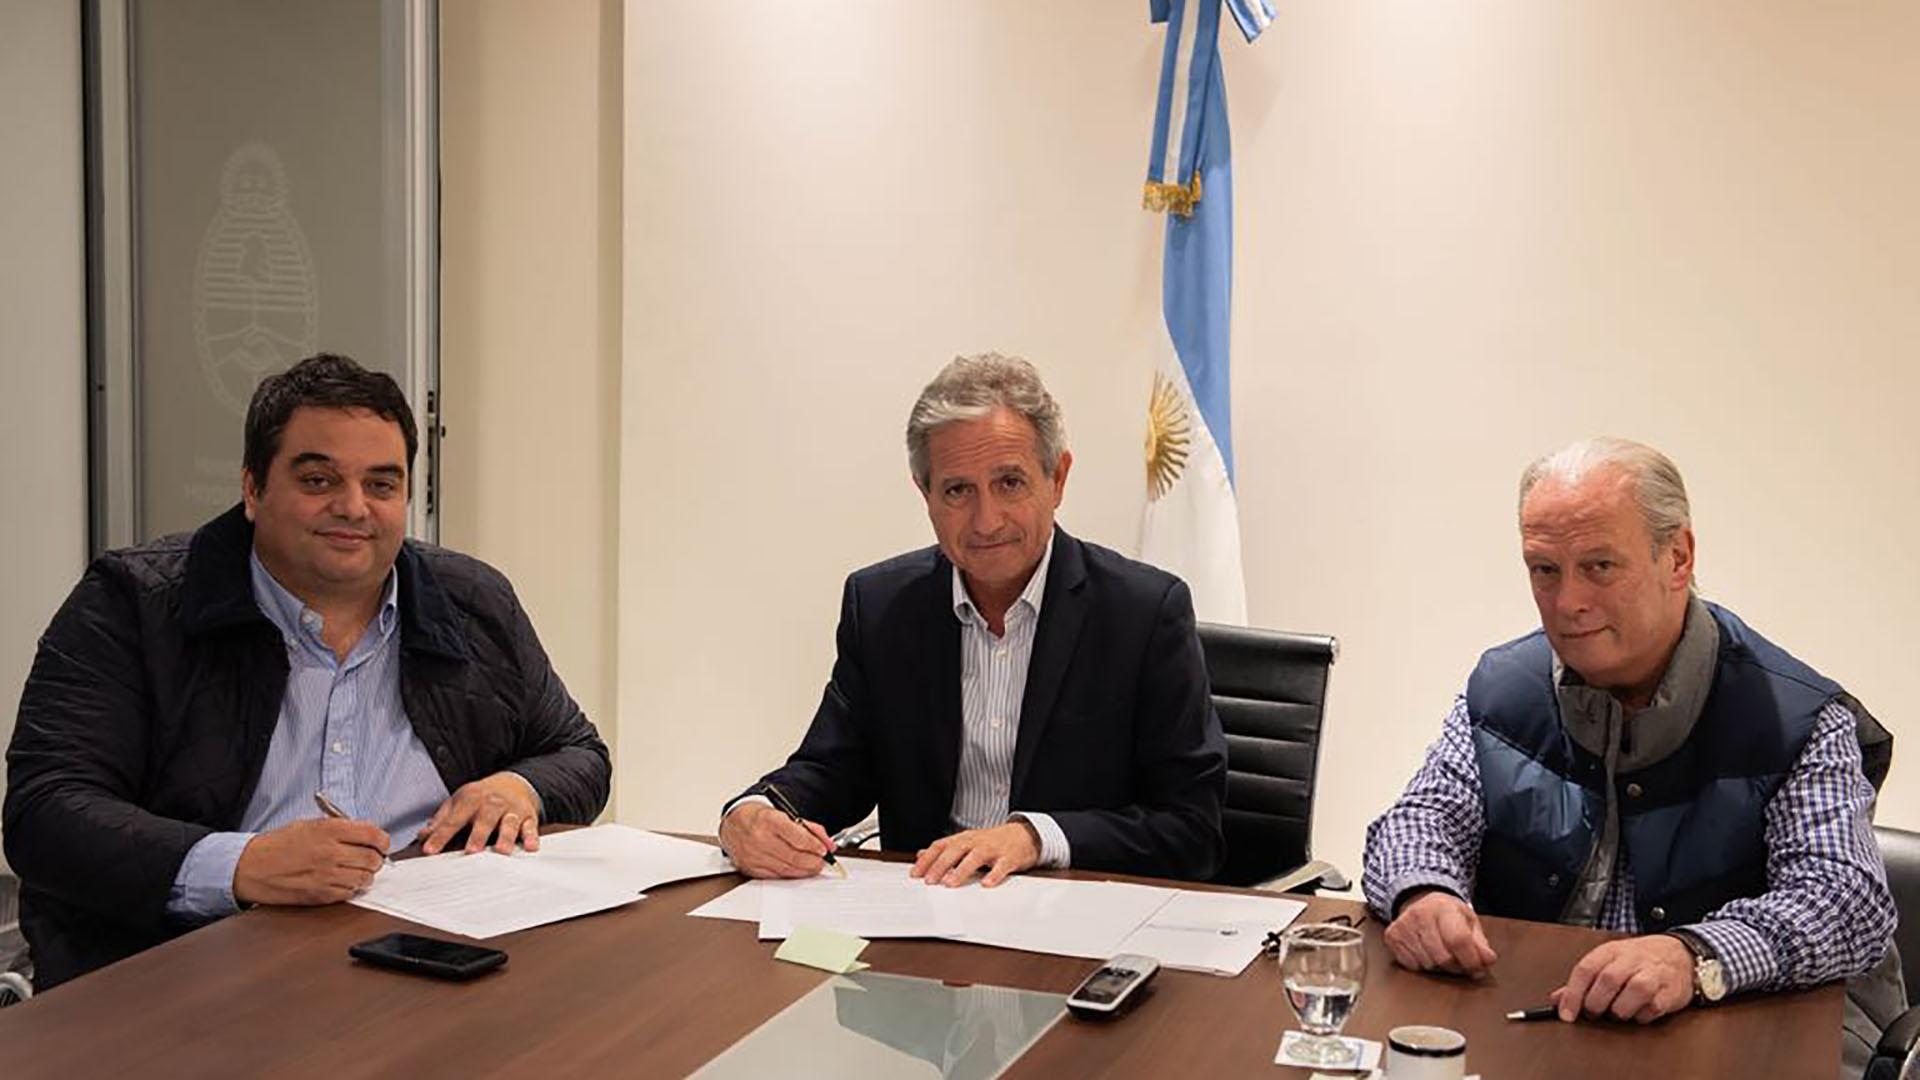 Los ministros Jorge Triaca y Andrés Ibarra junto al sindicalista Andrés Rodríguez